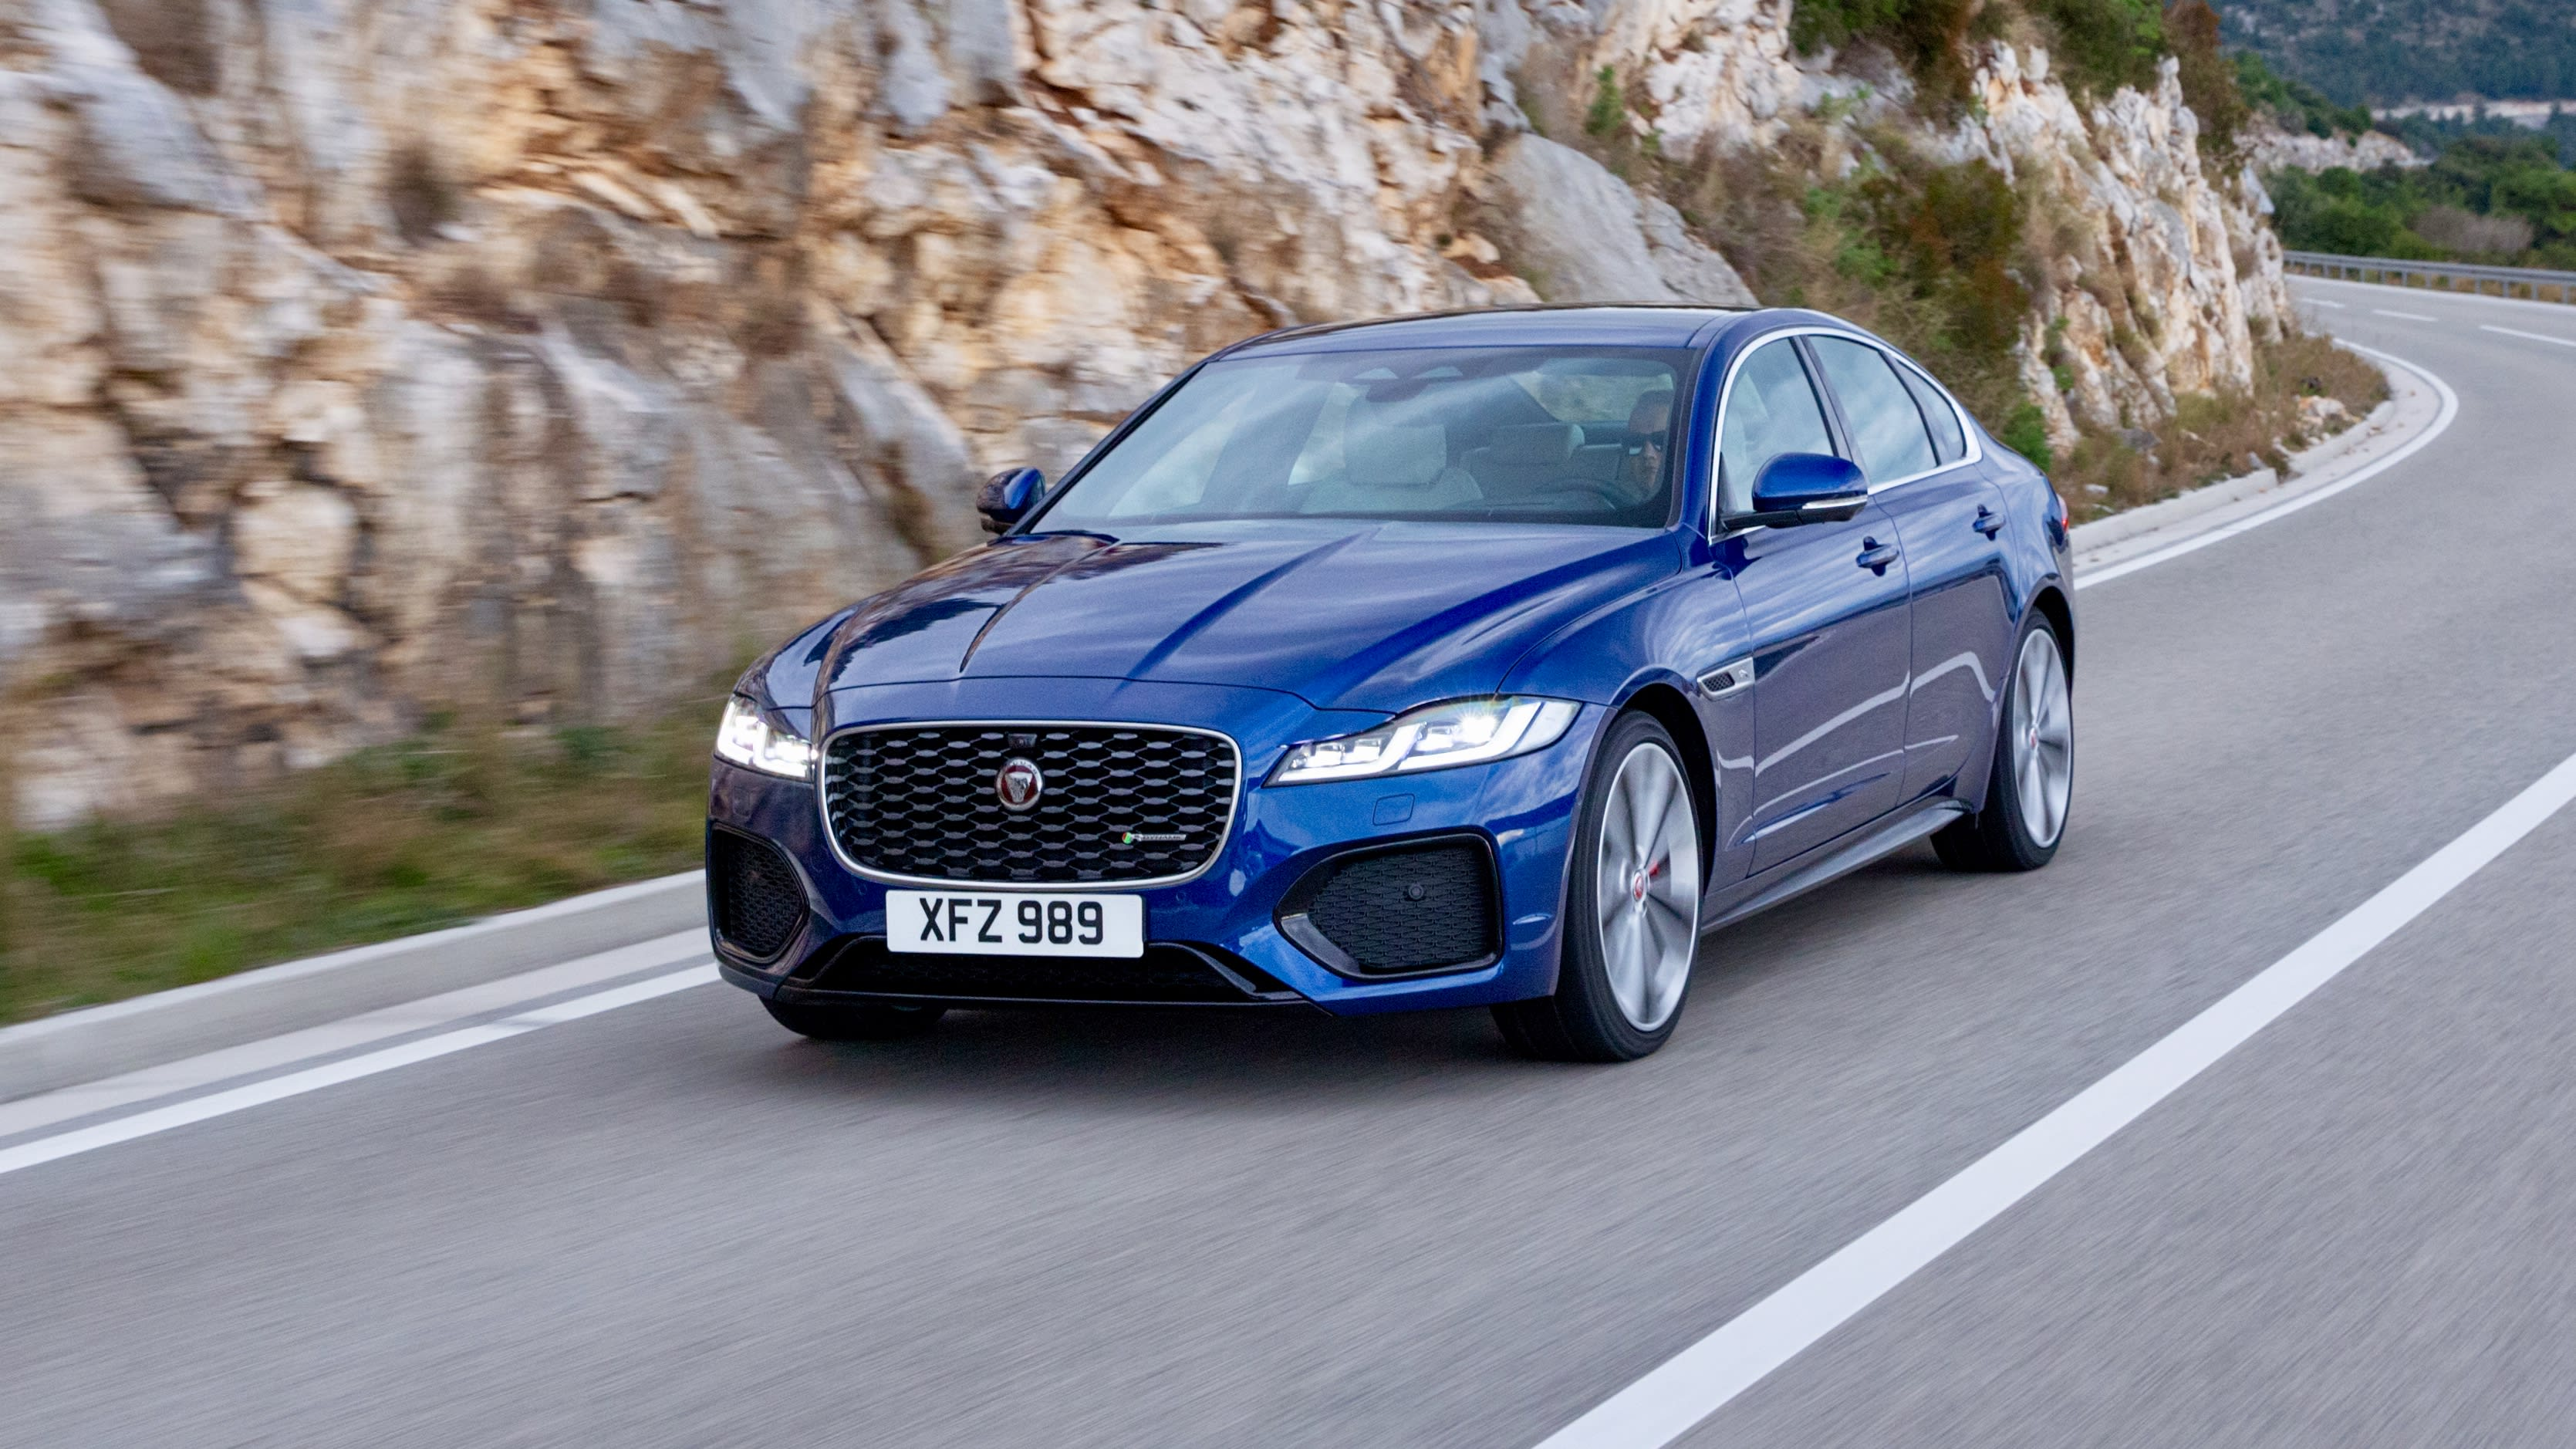 2021 Jaguar Xe V6 Specs and Review